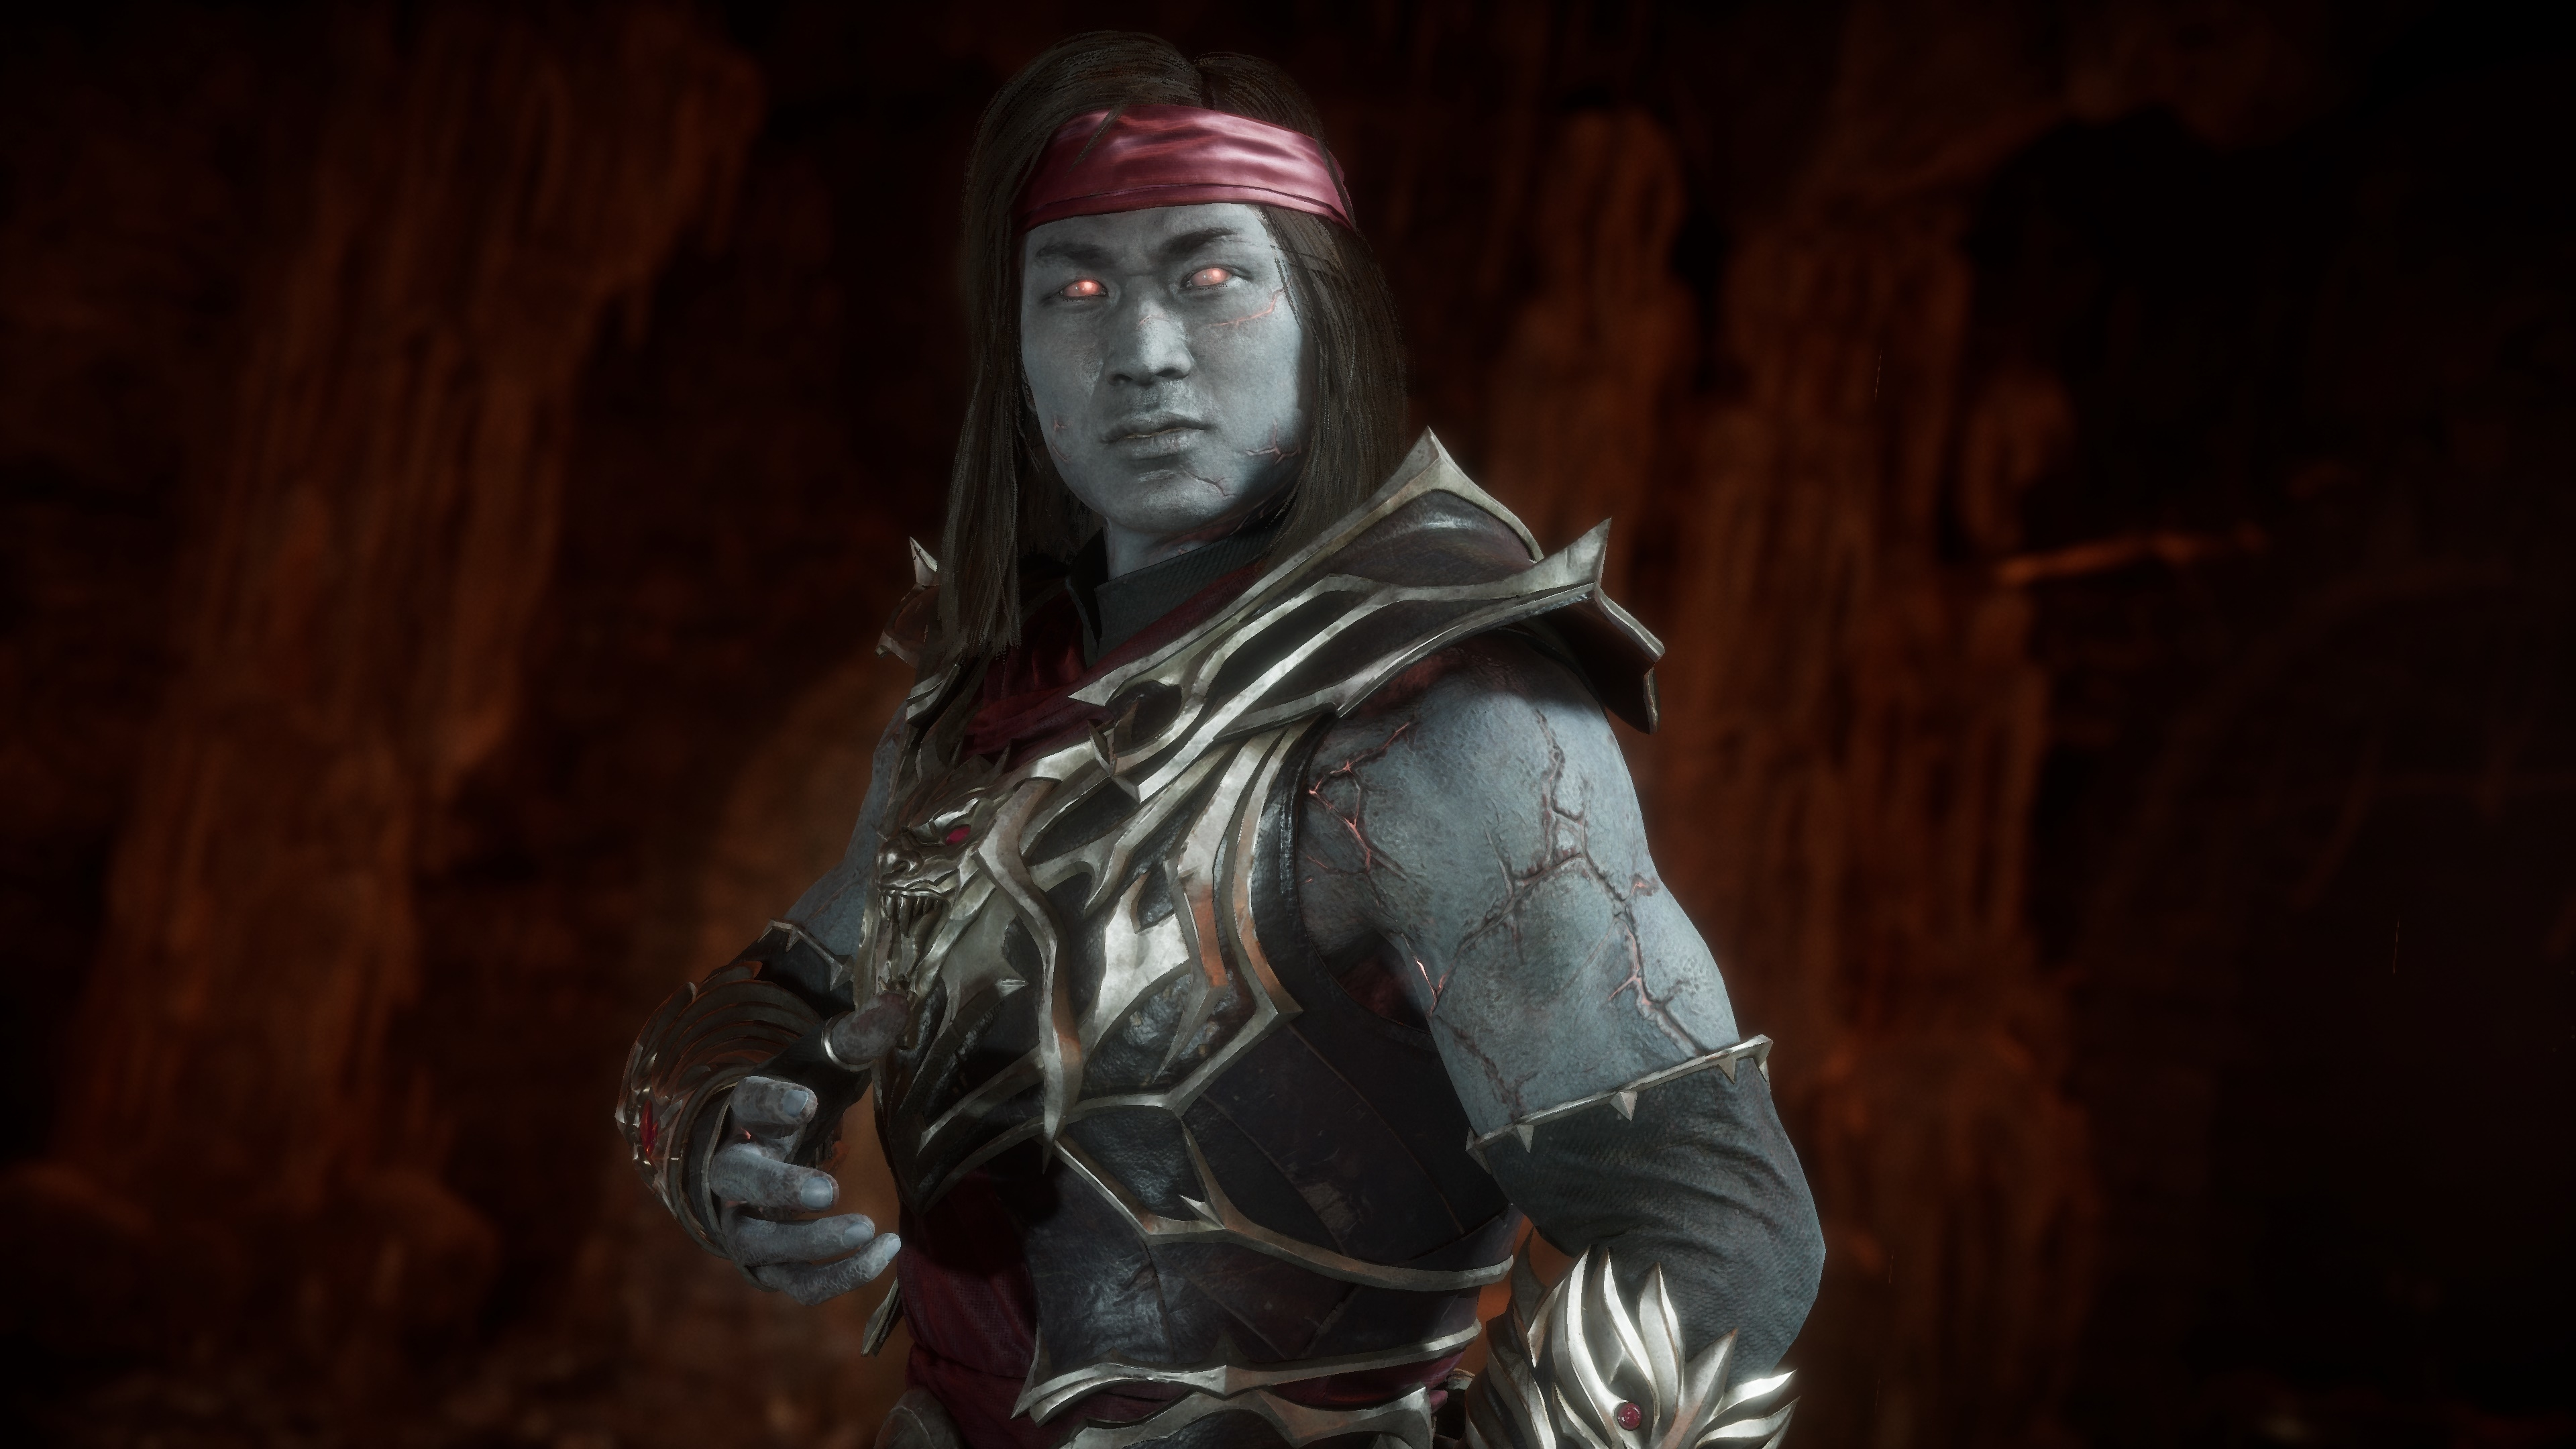 1080x2340 Liu Kang In Mortal Kombat 11 1080x2340 Resolution Wallpaper Hd Games 4k Wallpapers Images Photos And Background